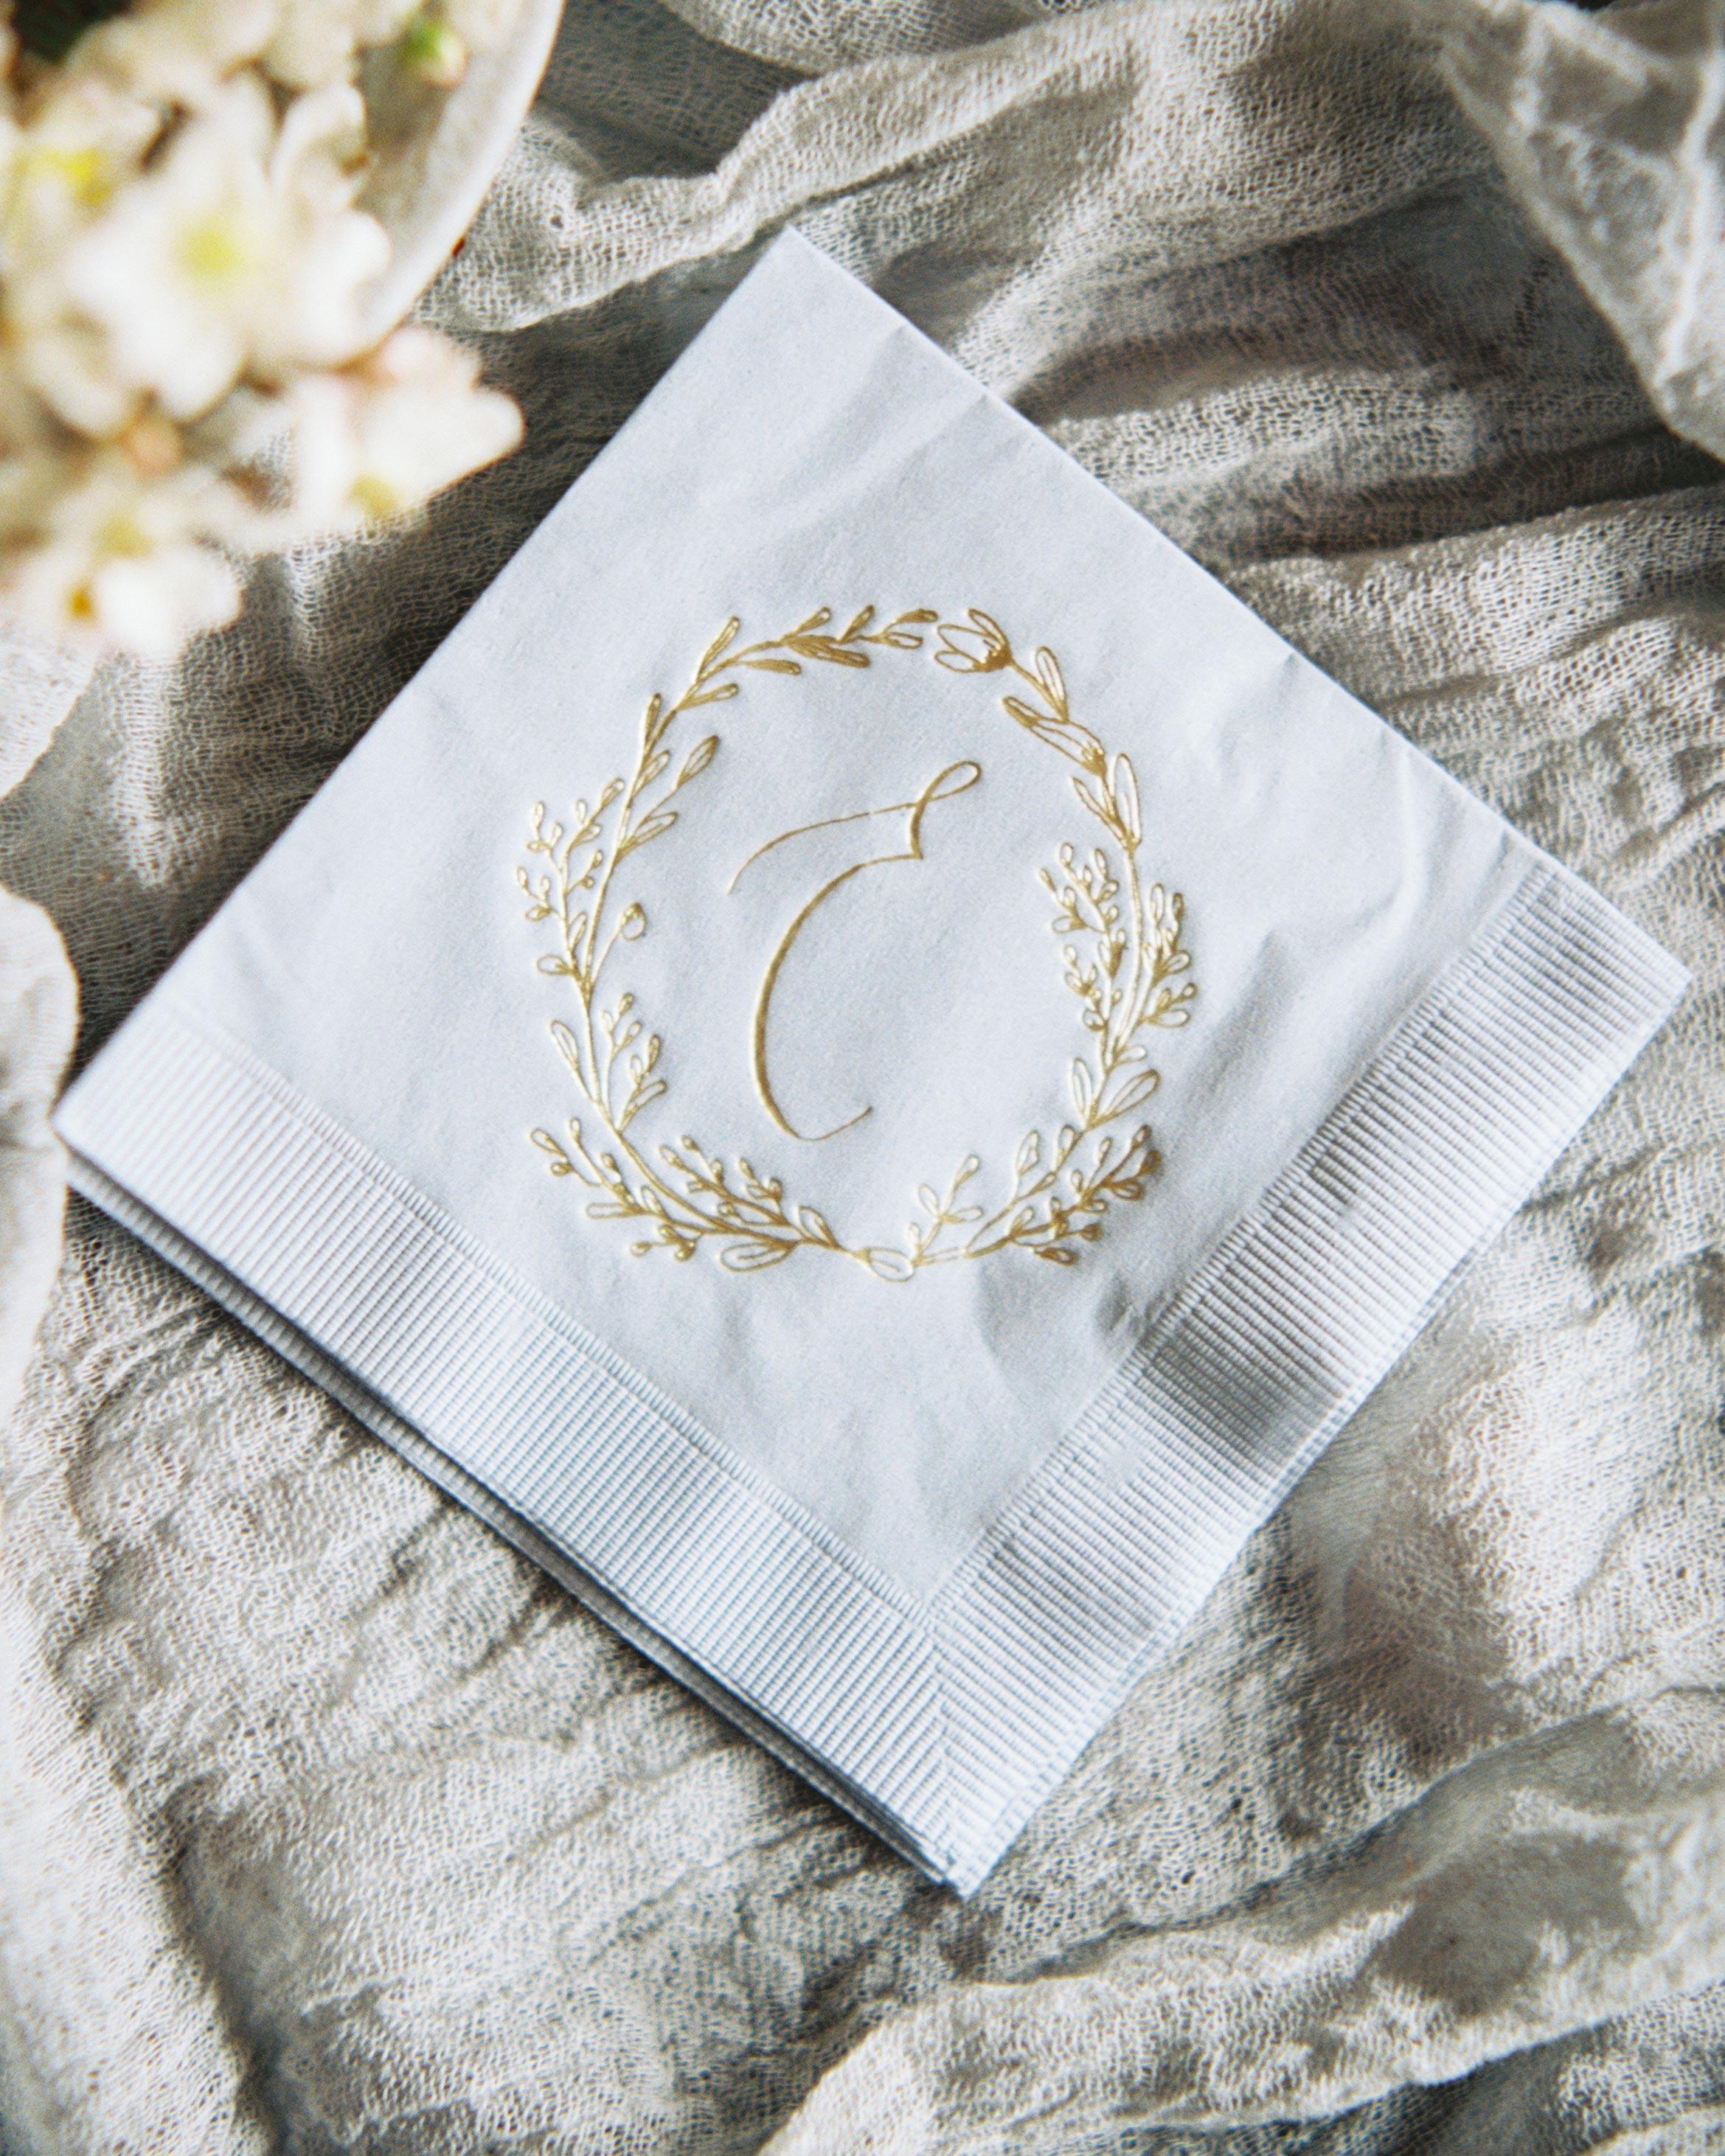 ginny-andrew-wedding-napkin-0019-s112676-0216.jpg